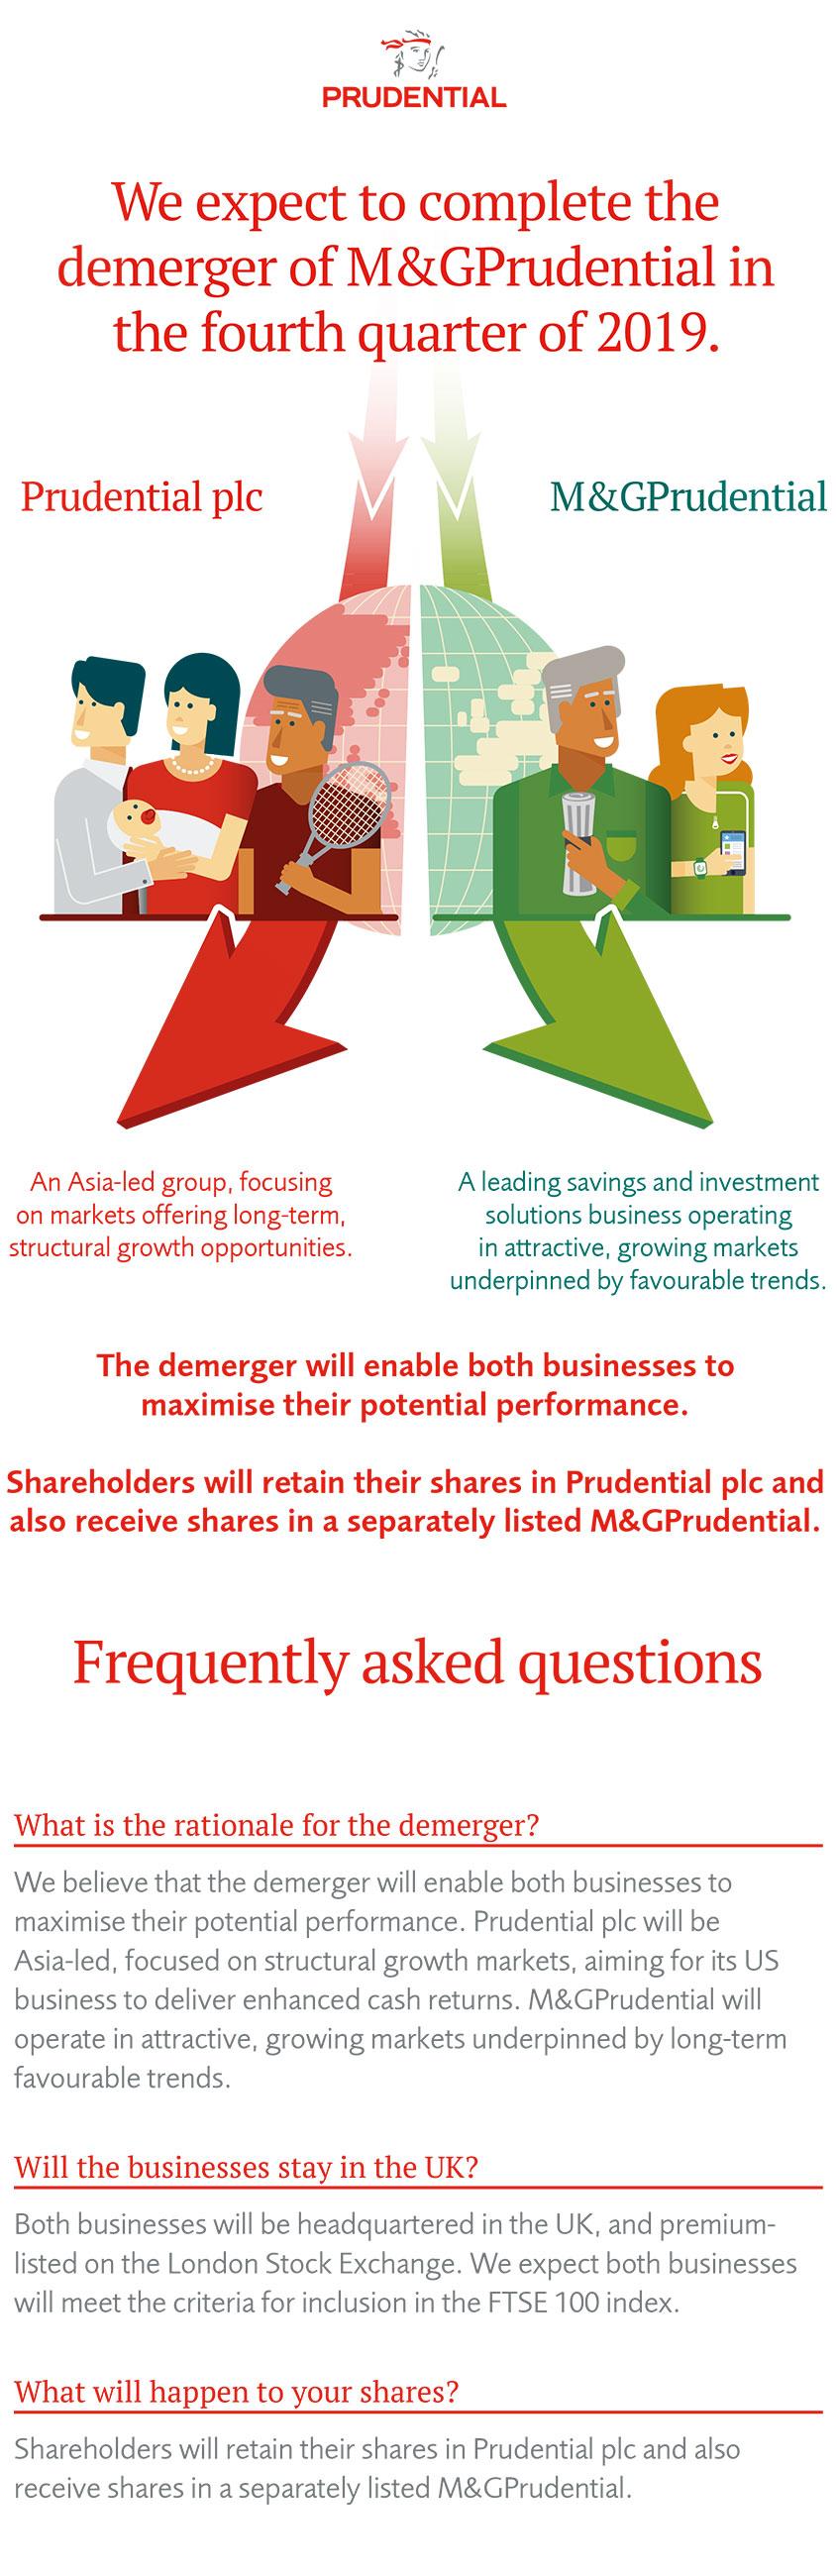 M&GPrudential demerger – Prudential plc